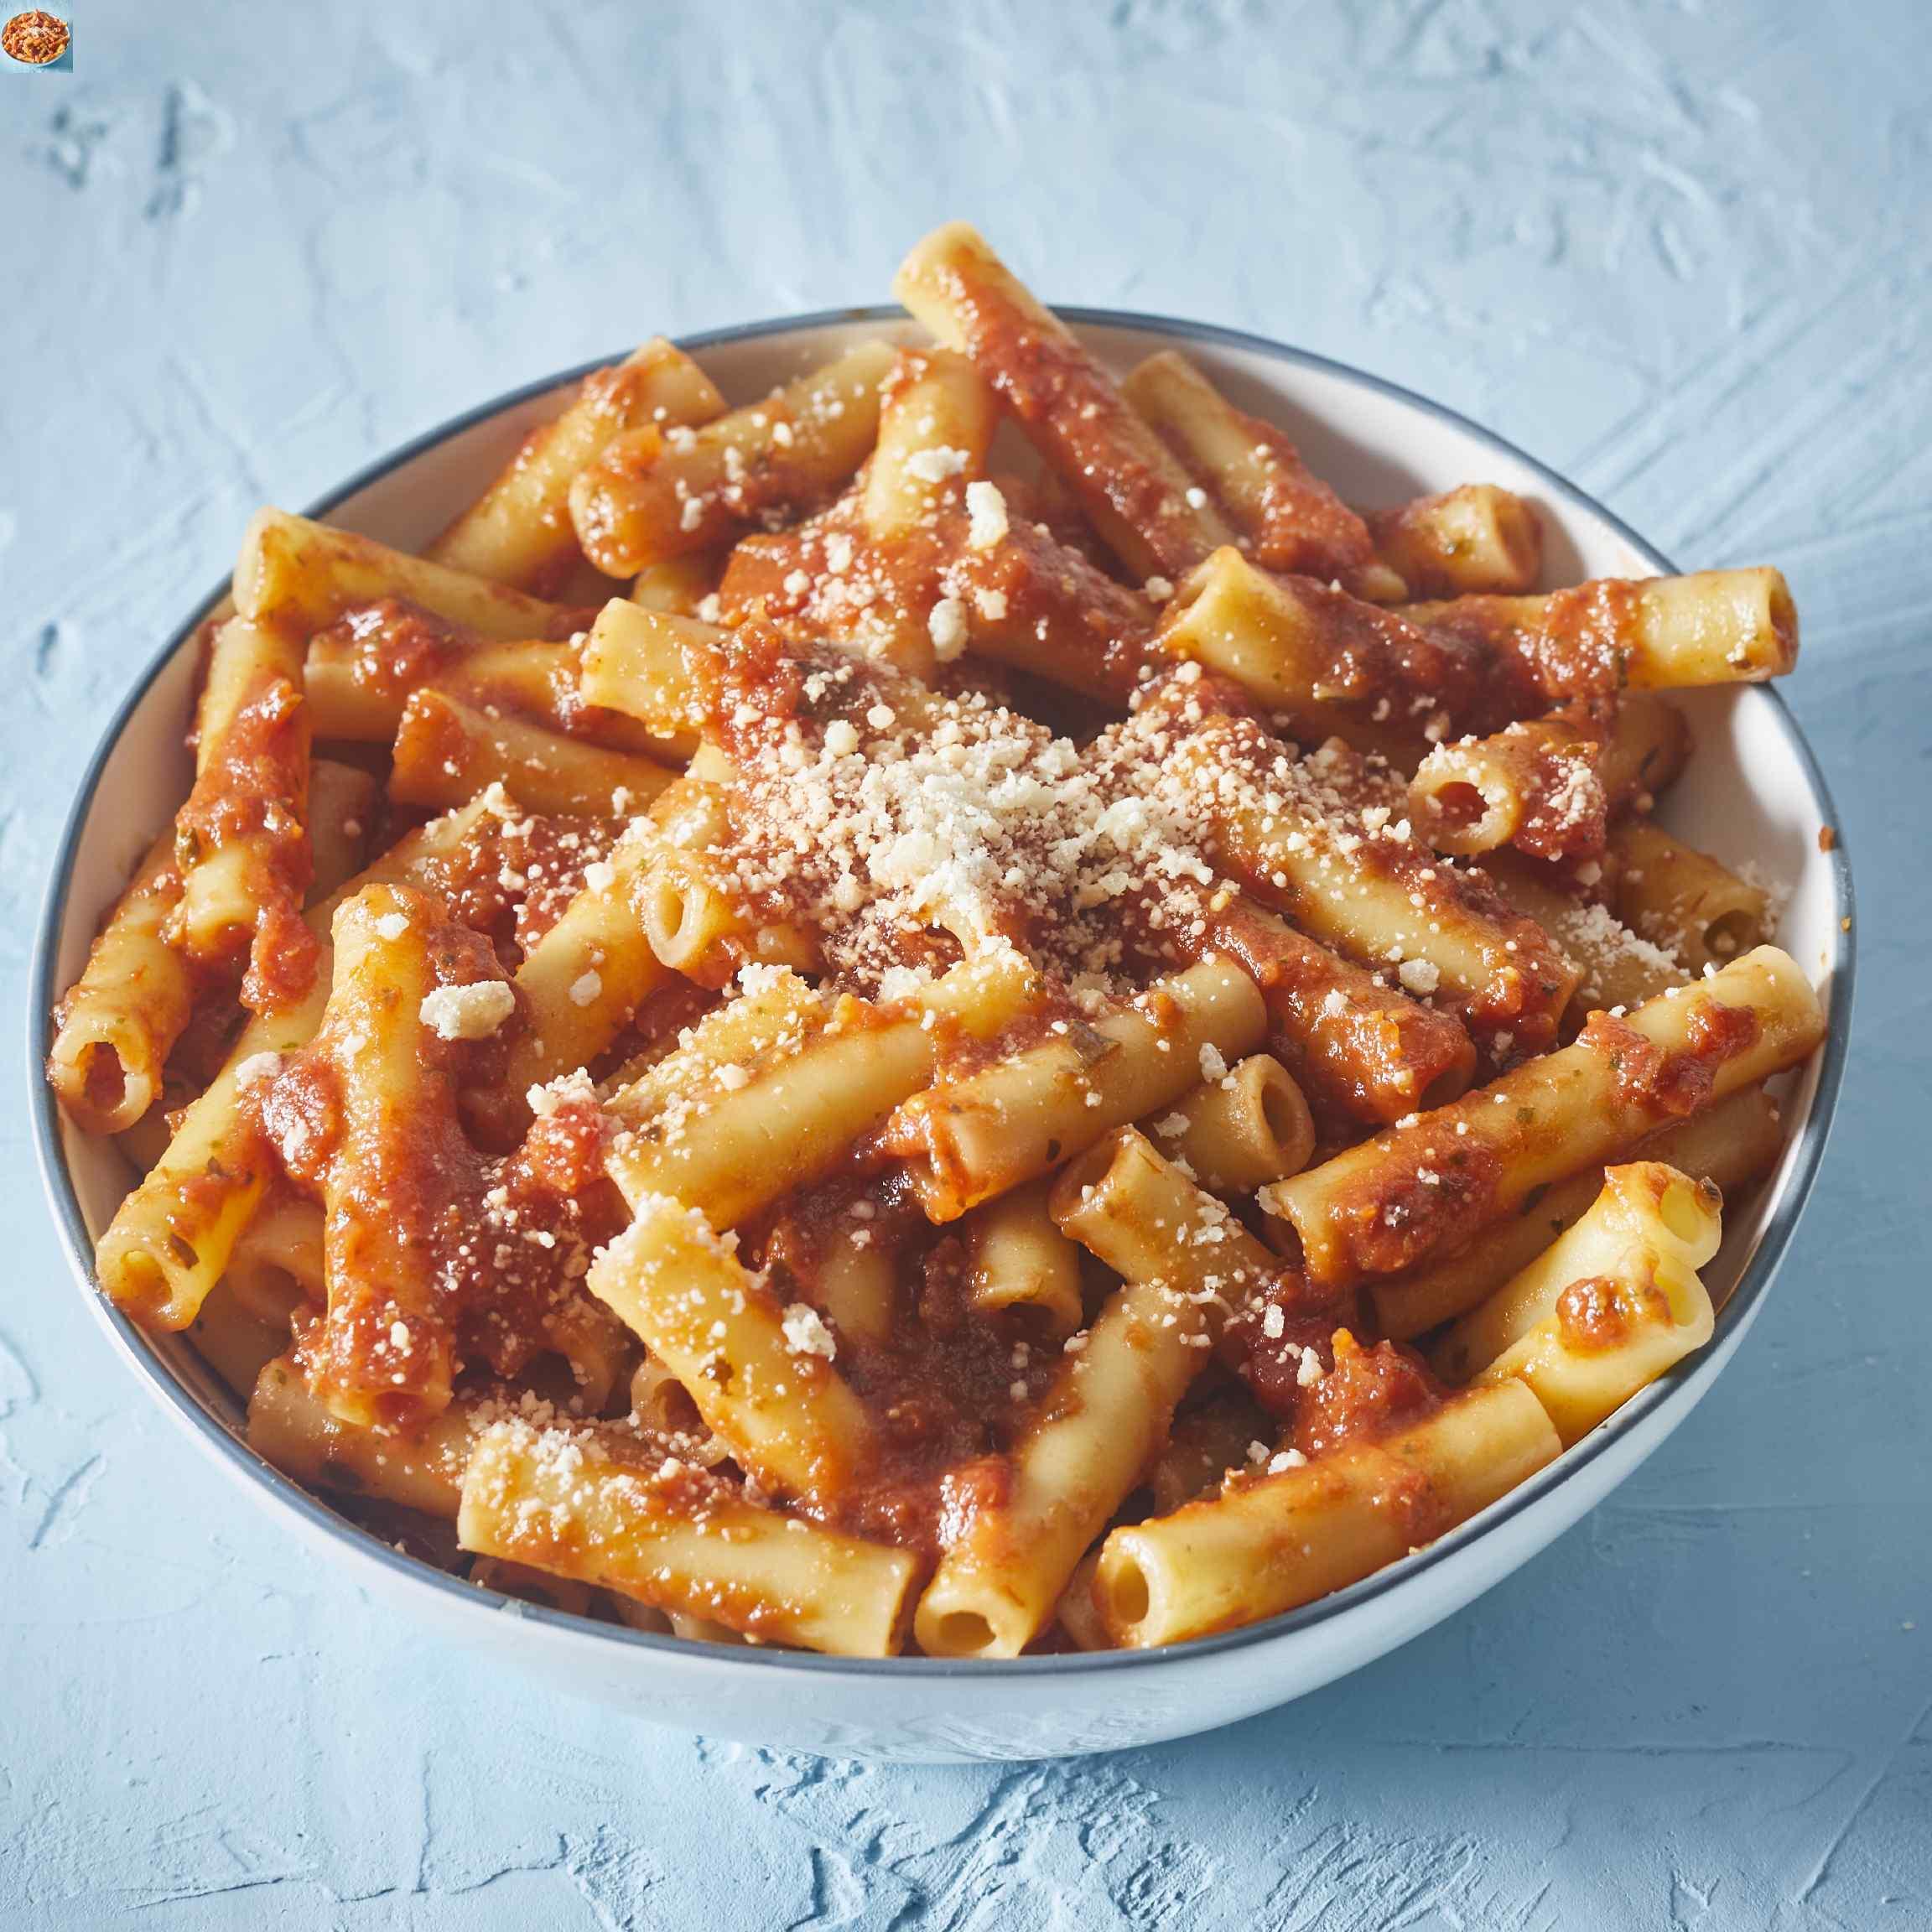 Ziti with Tomato-Pesto Sauce Risa G